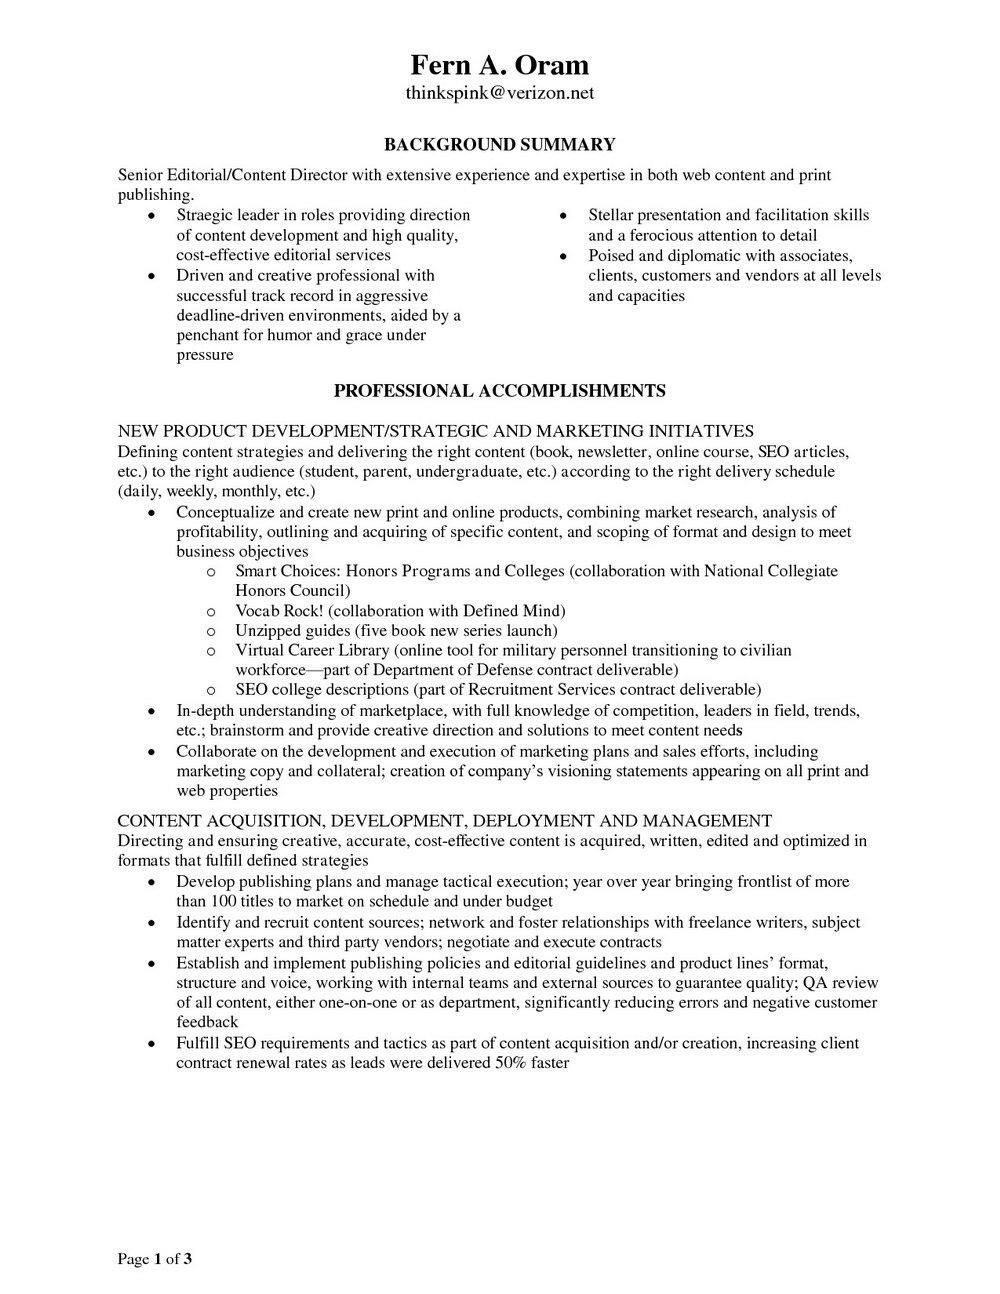 Monster Resume Writing Service Login